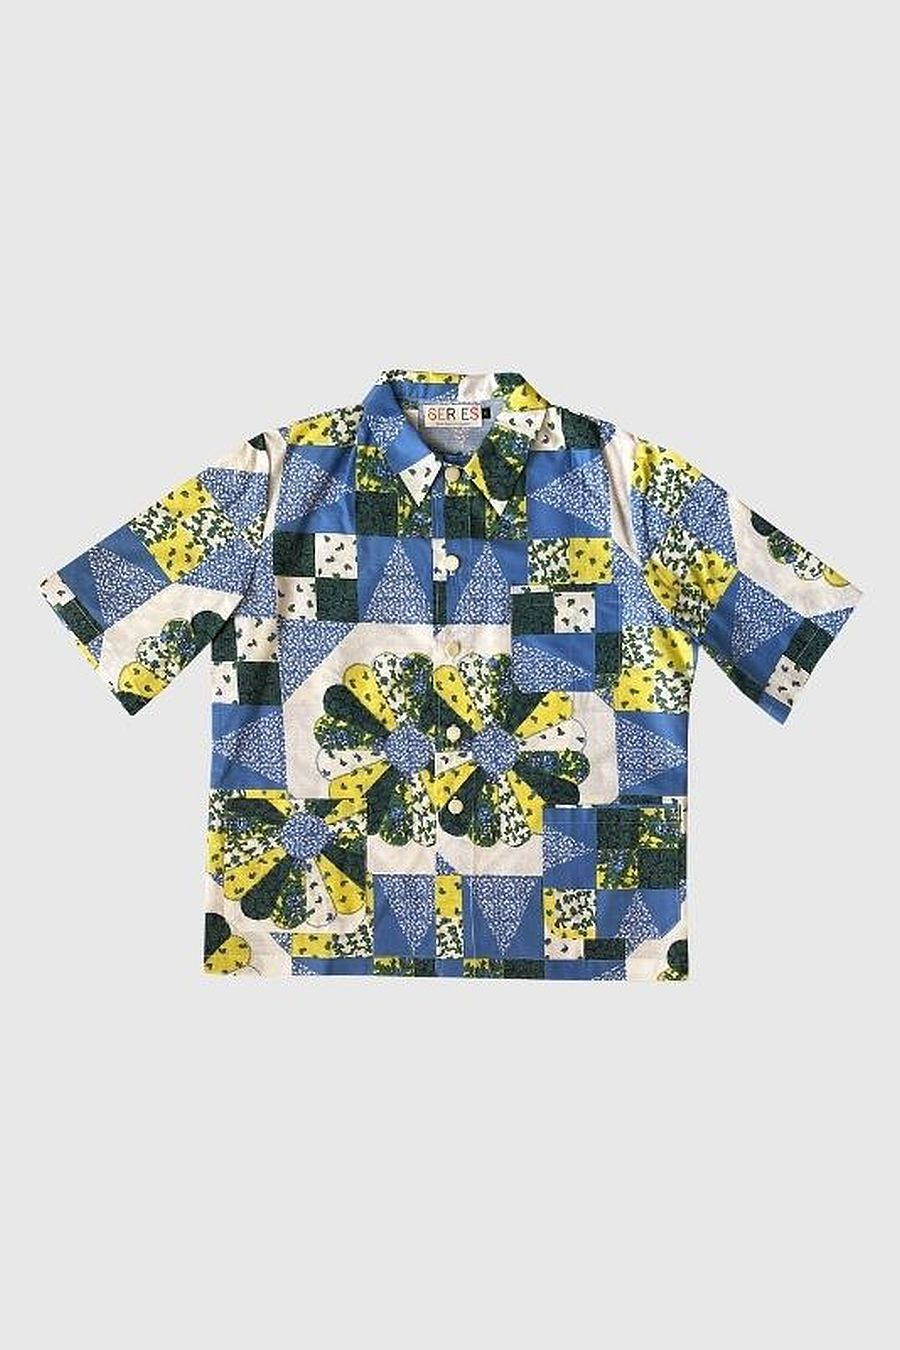 The Series NY Chore Shirt - CSCH006